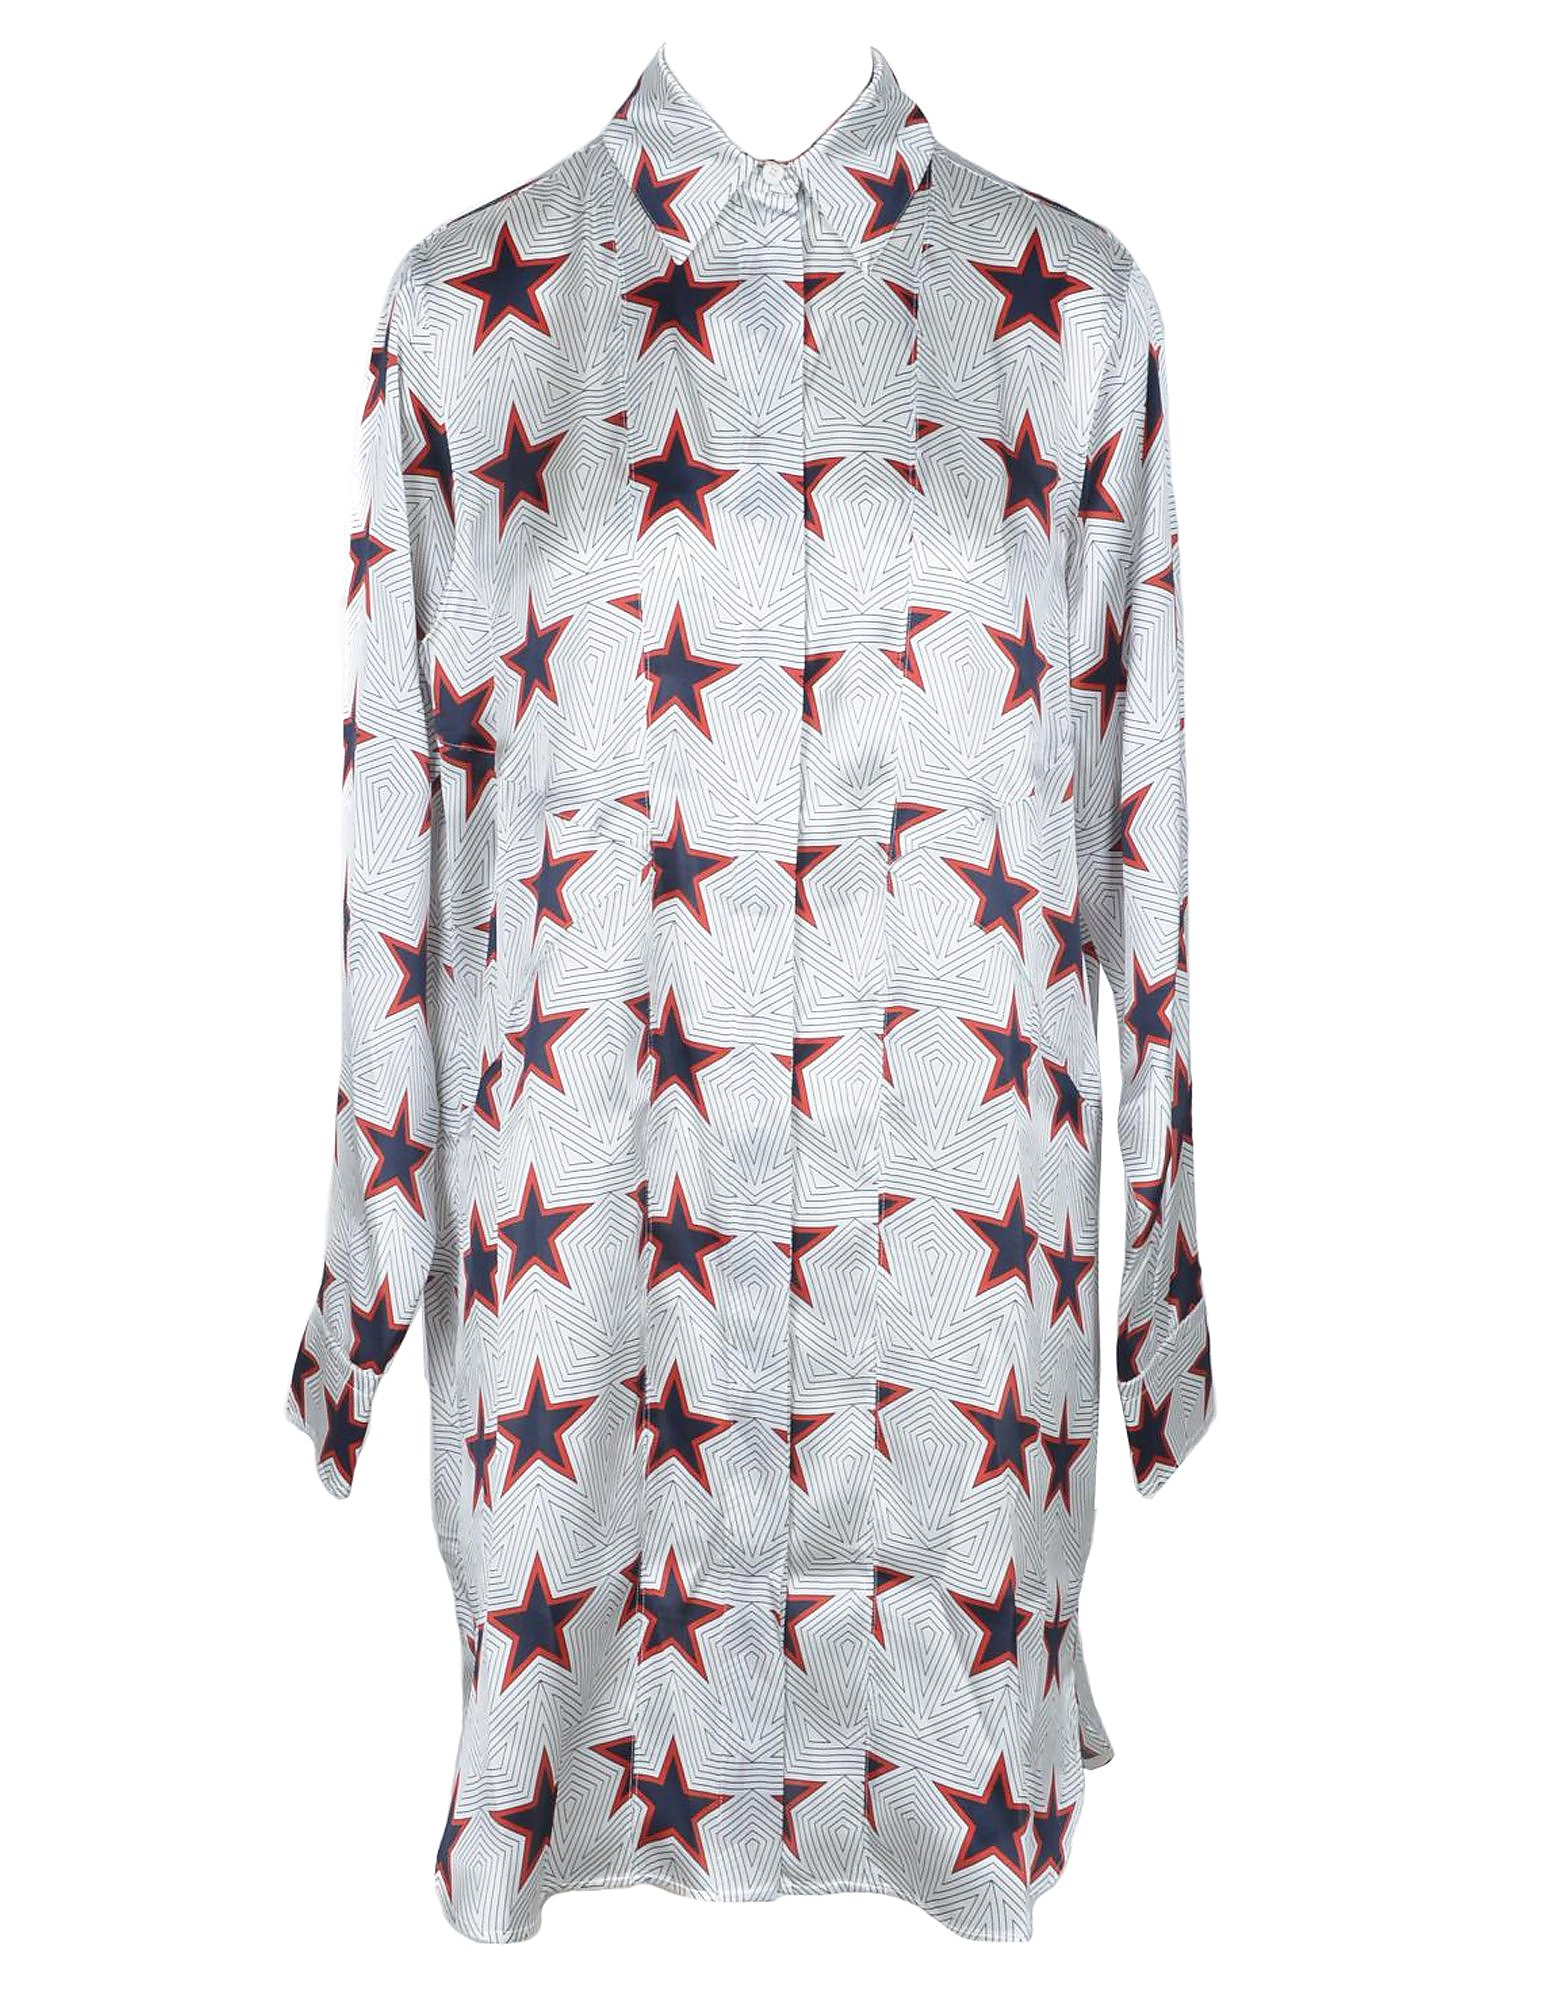 SportMax Designer Dresses & Jumpsuits, Stars Print Pure Silk Women's Shirt Dress